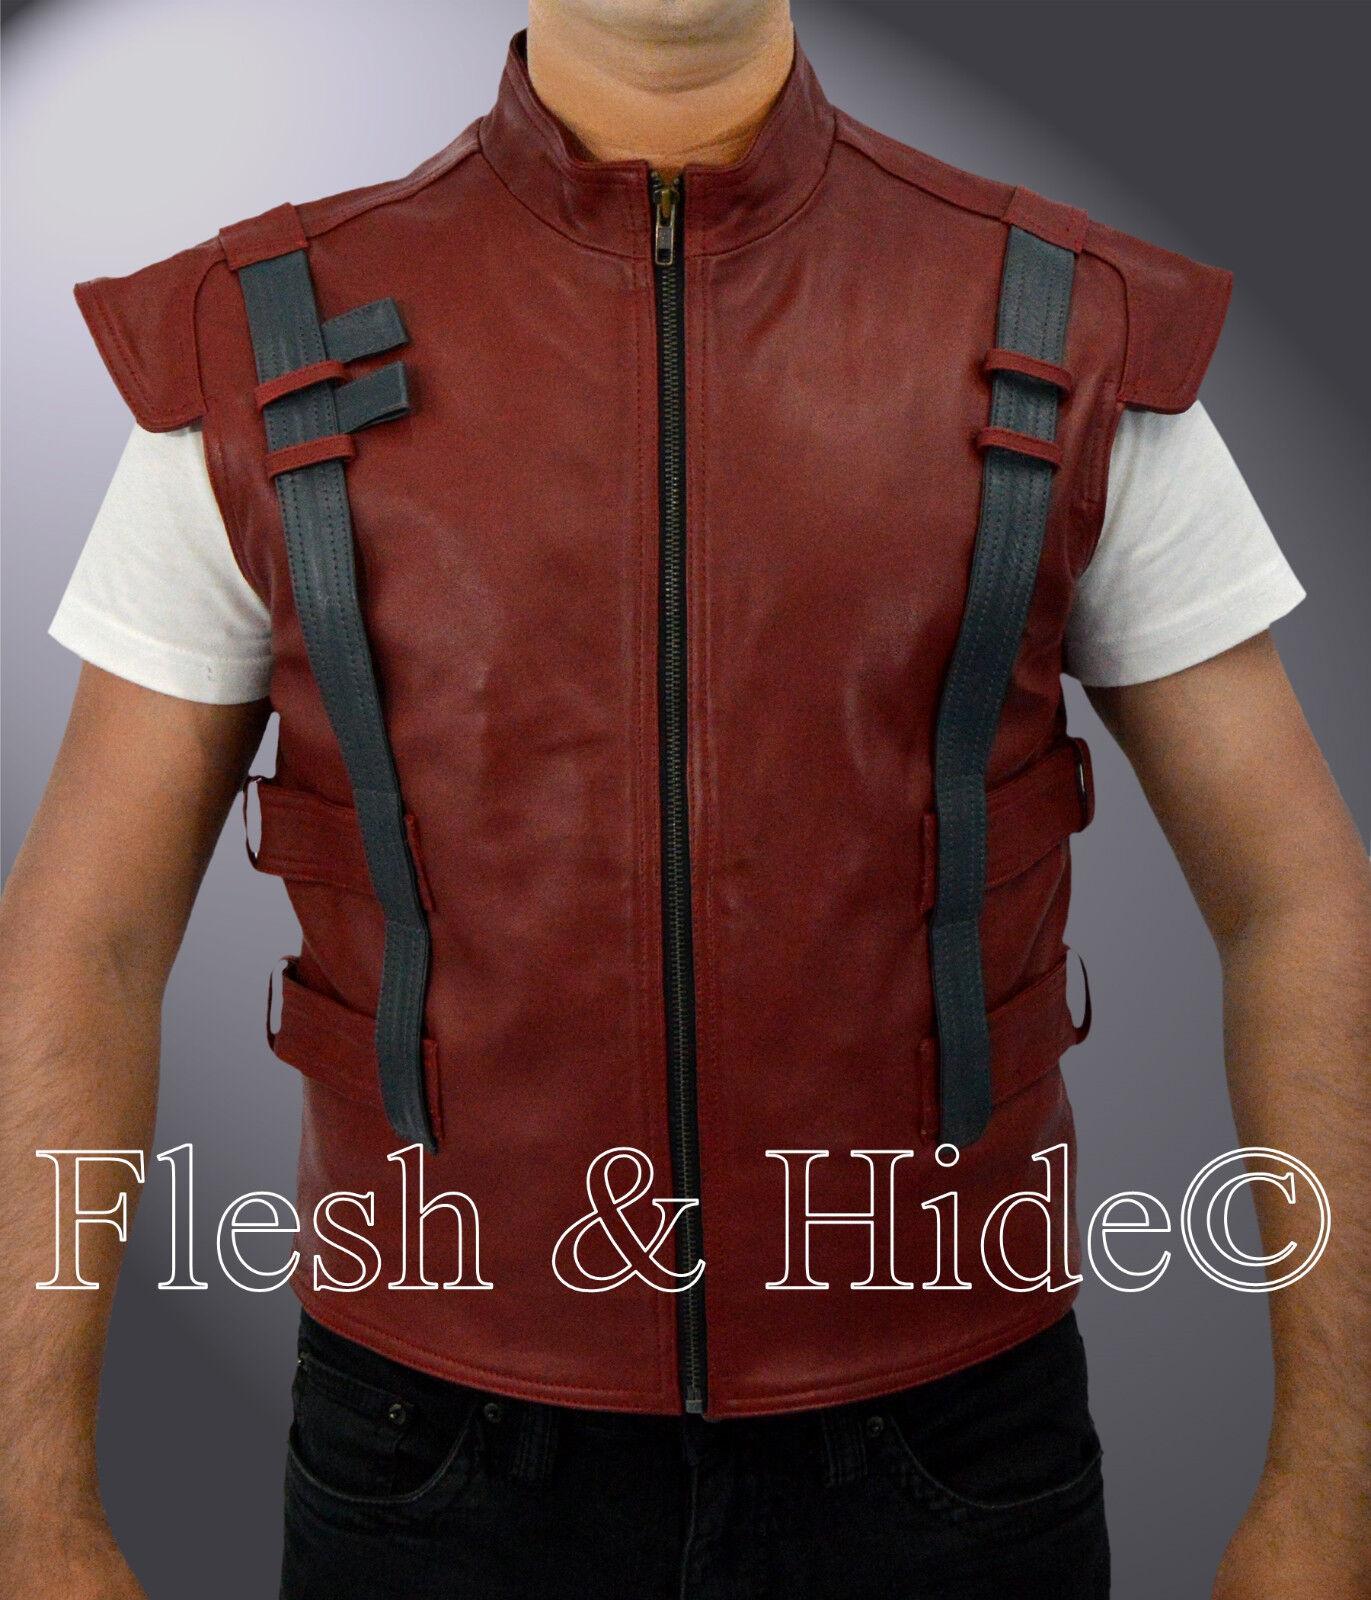 Guardians of the Galaxy Chris Pratt Star Lord Peter Quill Vest